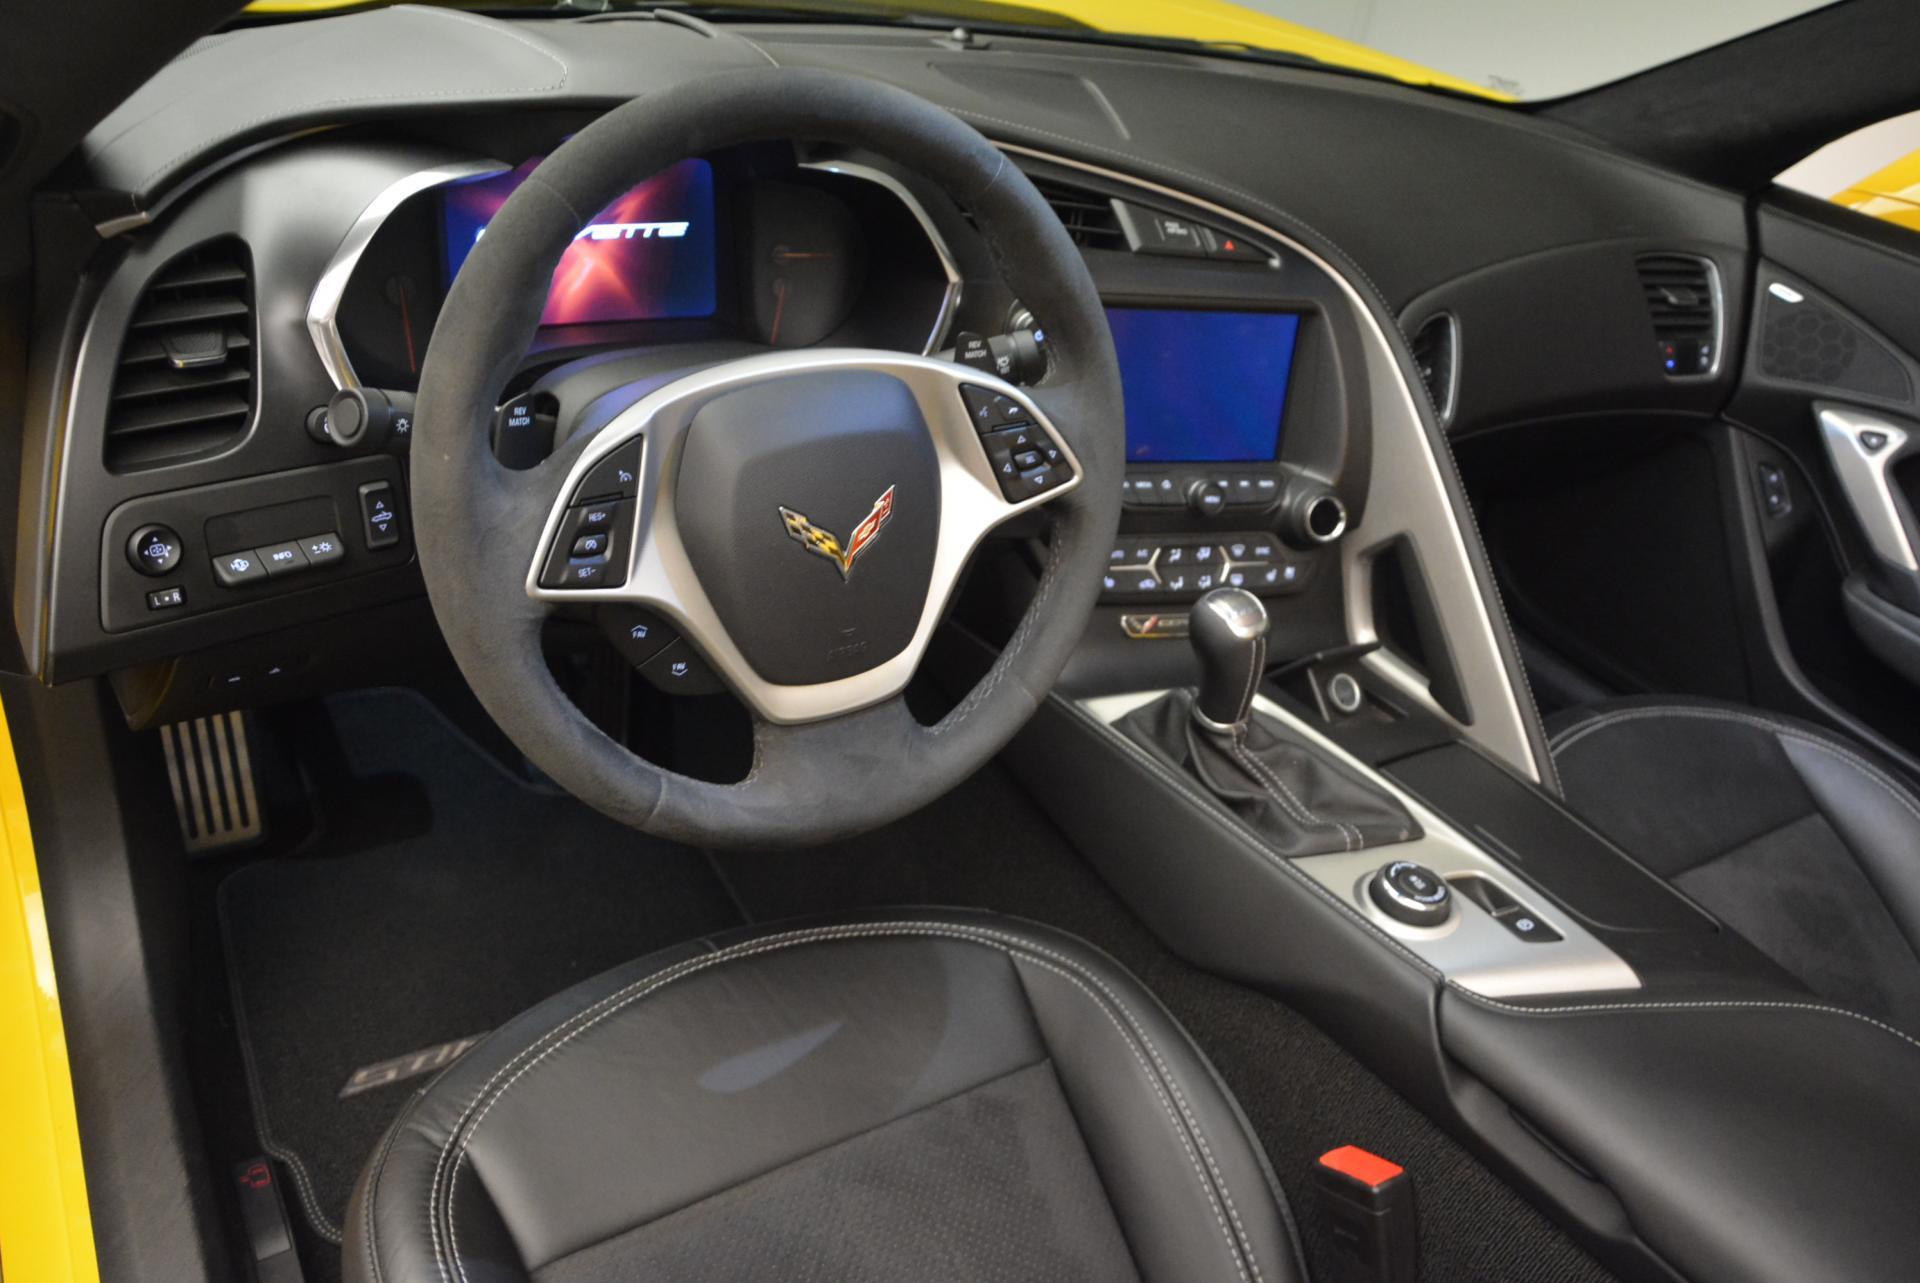 Used 2014 Chevrolet Corvette Stingray Z51 For Sale In Greenwich, CT 523_p15